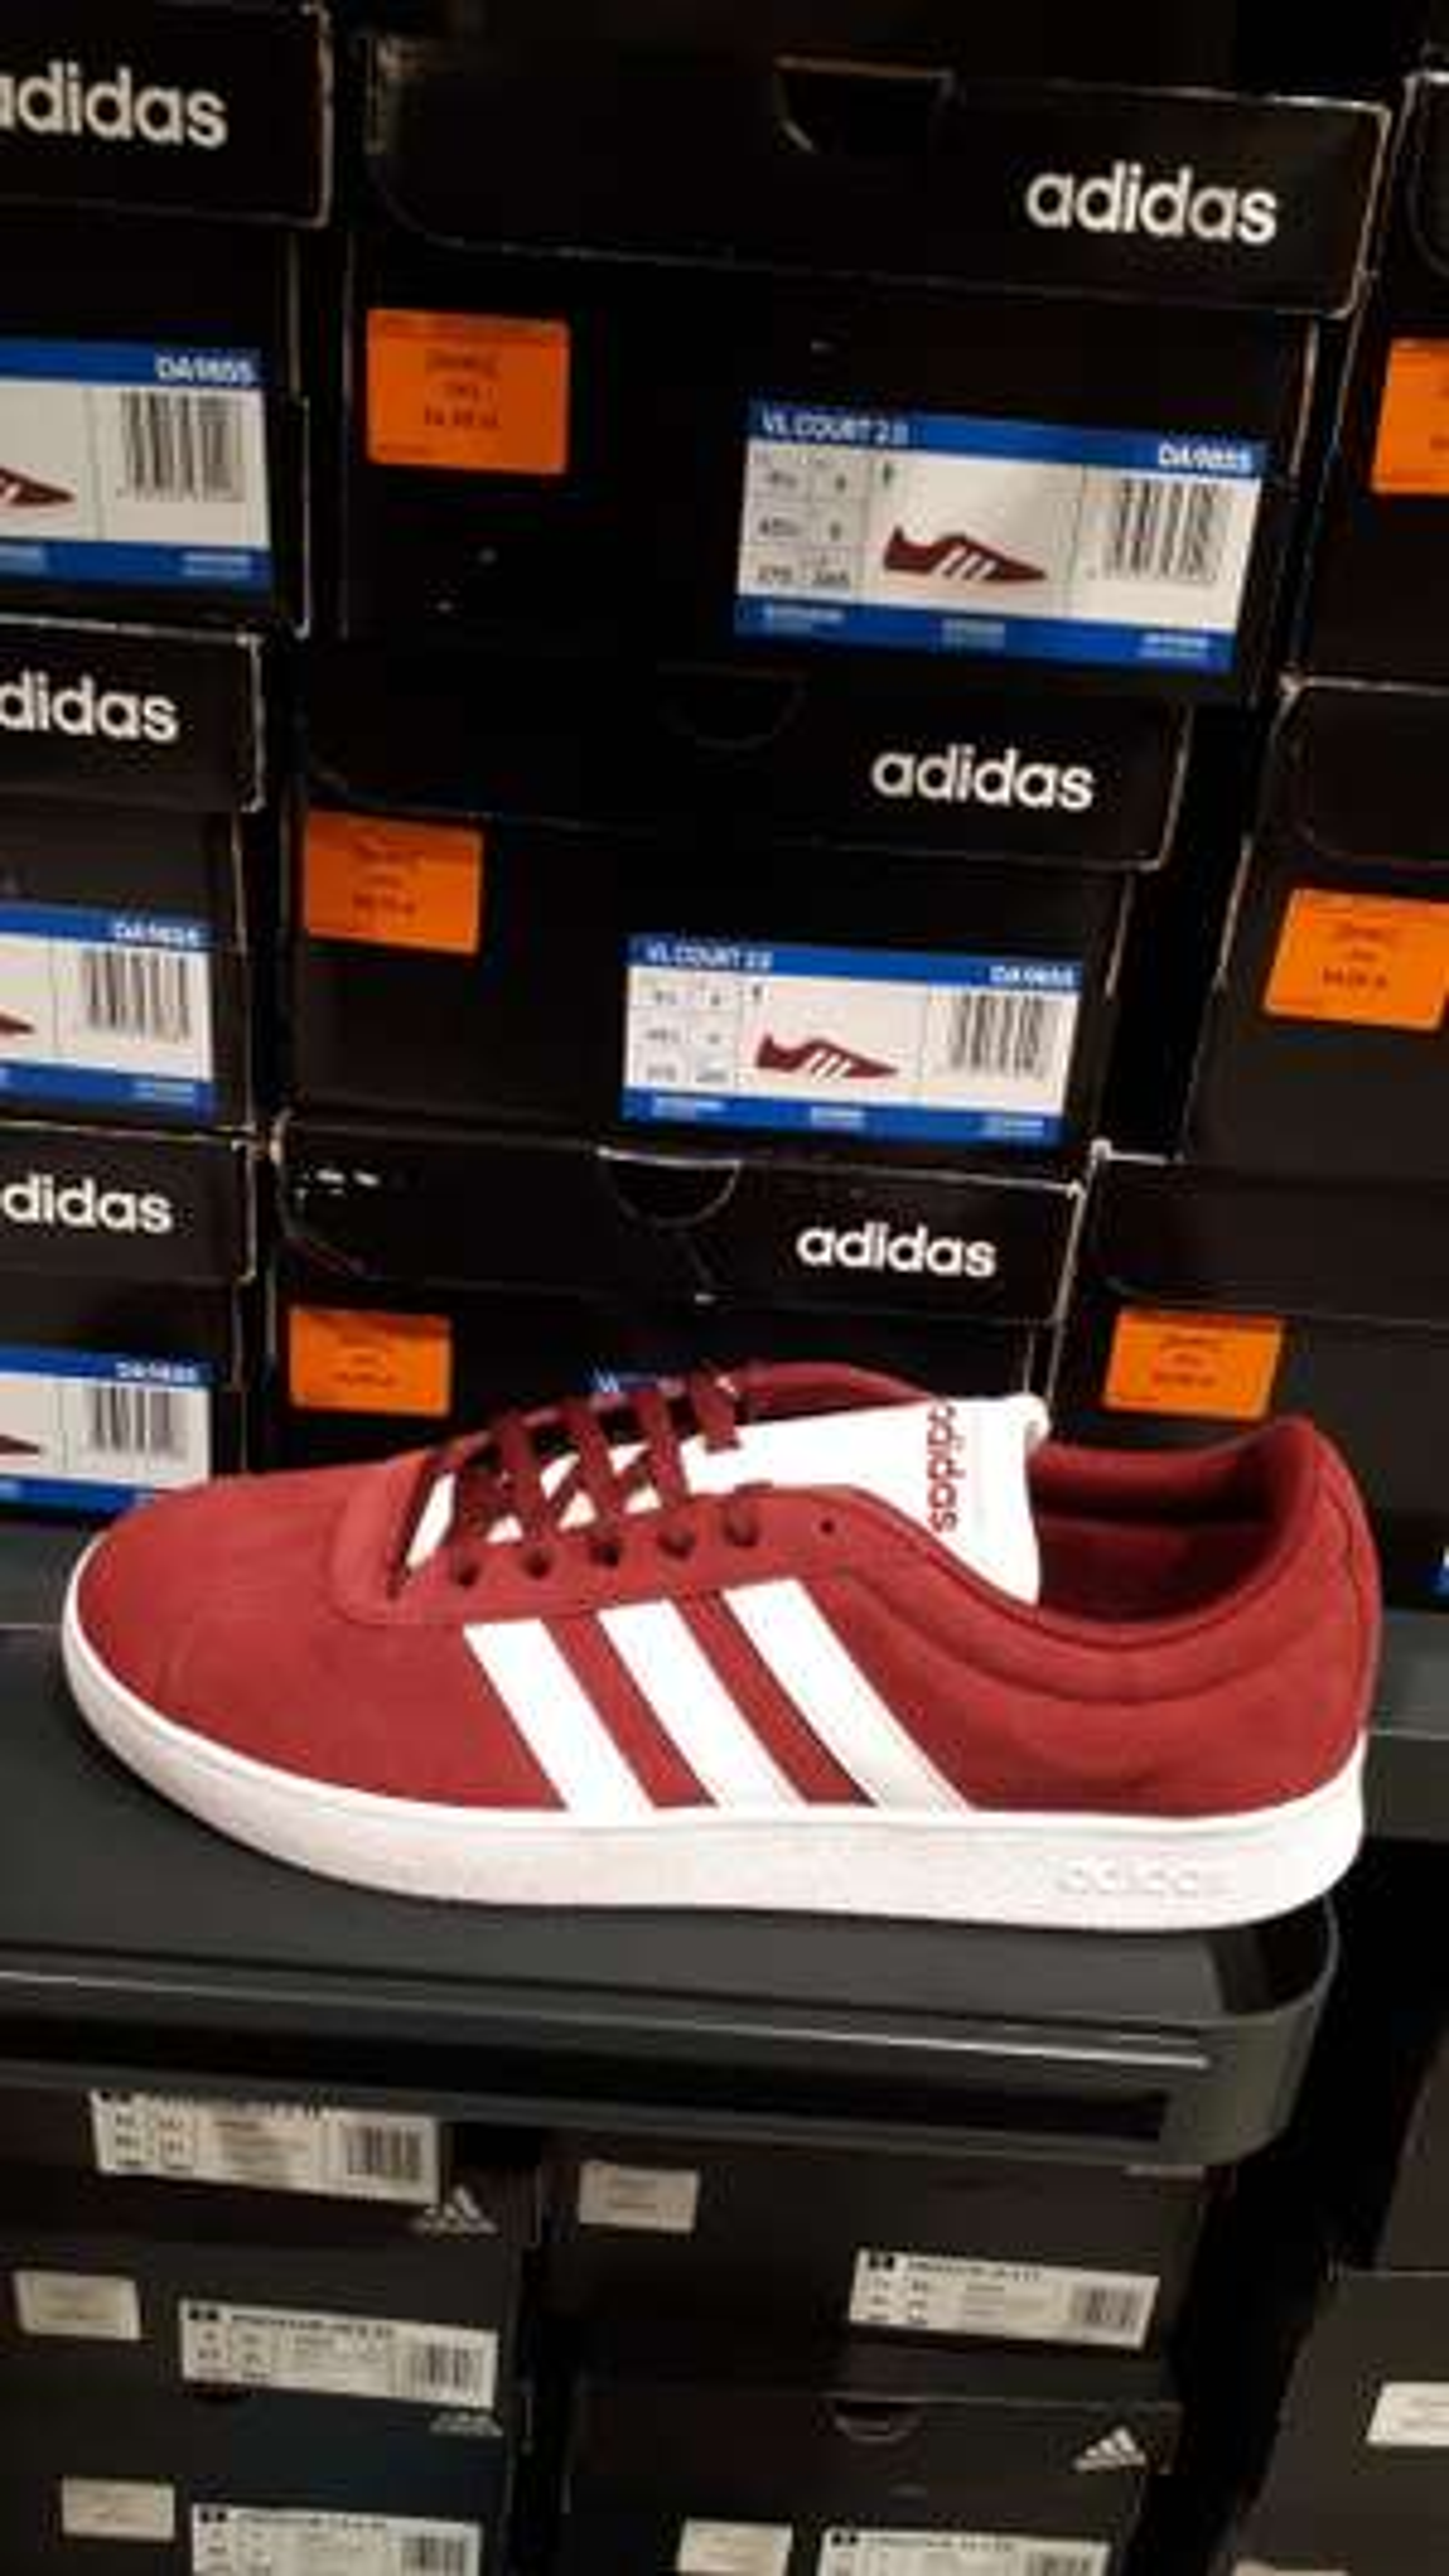 Adidas VL COURT 2.0 - Factory Gliwice